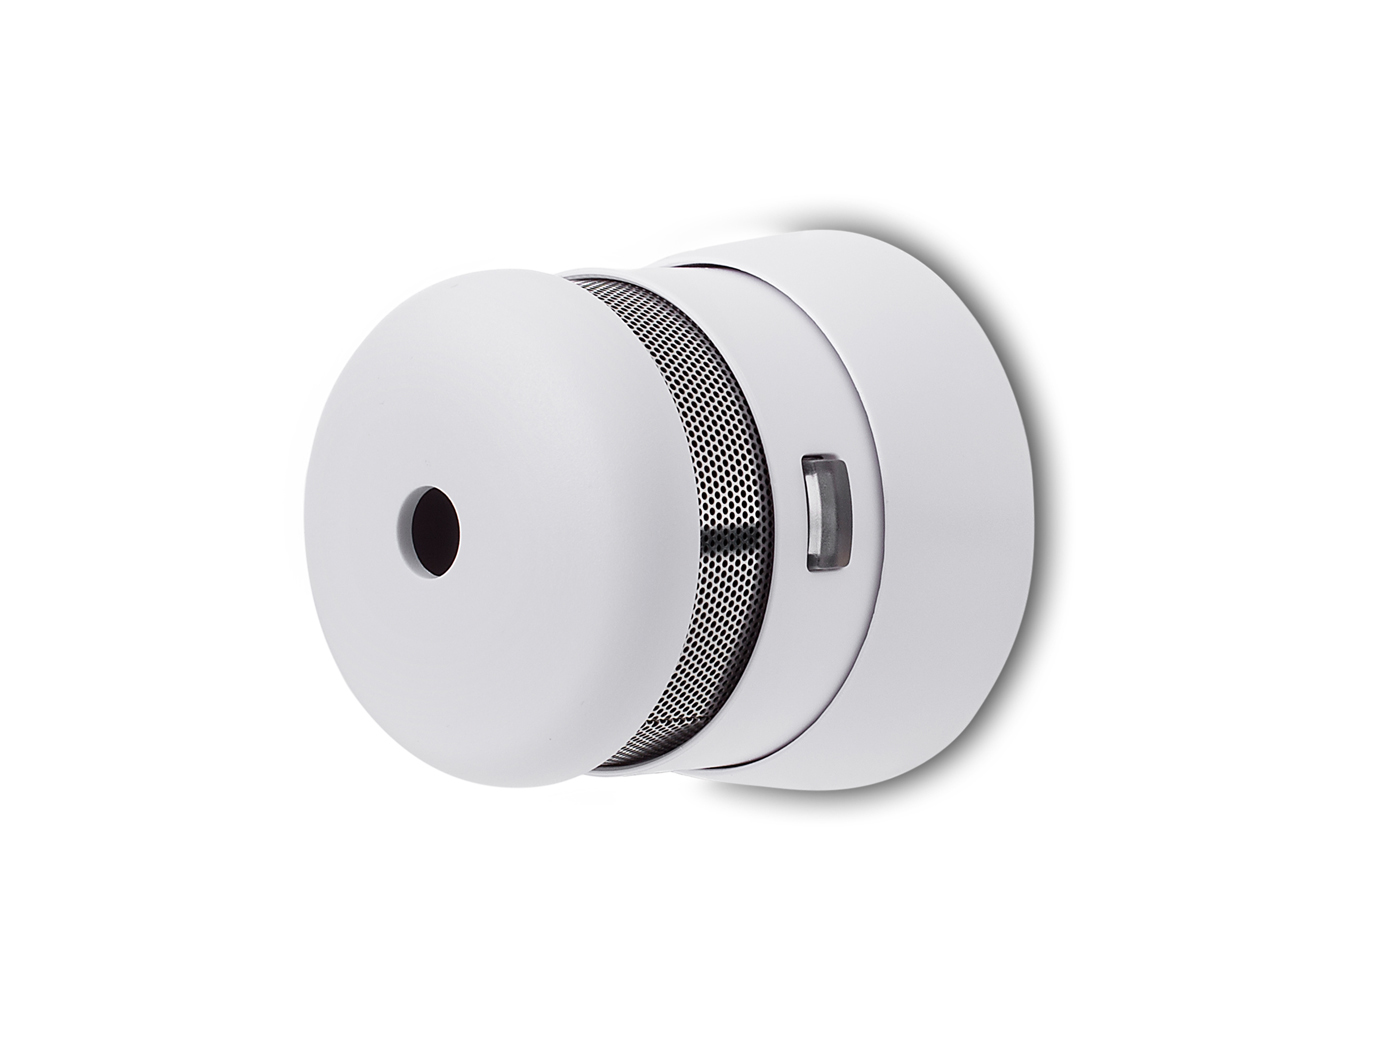 3er set mini design rauchmelder 10 jahres batterie mit magnetbefestigung alarm. Black Bedroom Furniture Sets. Home Design Ideas